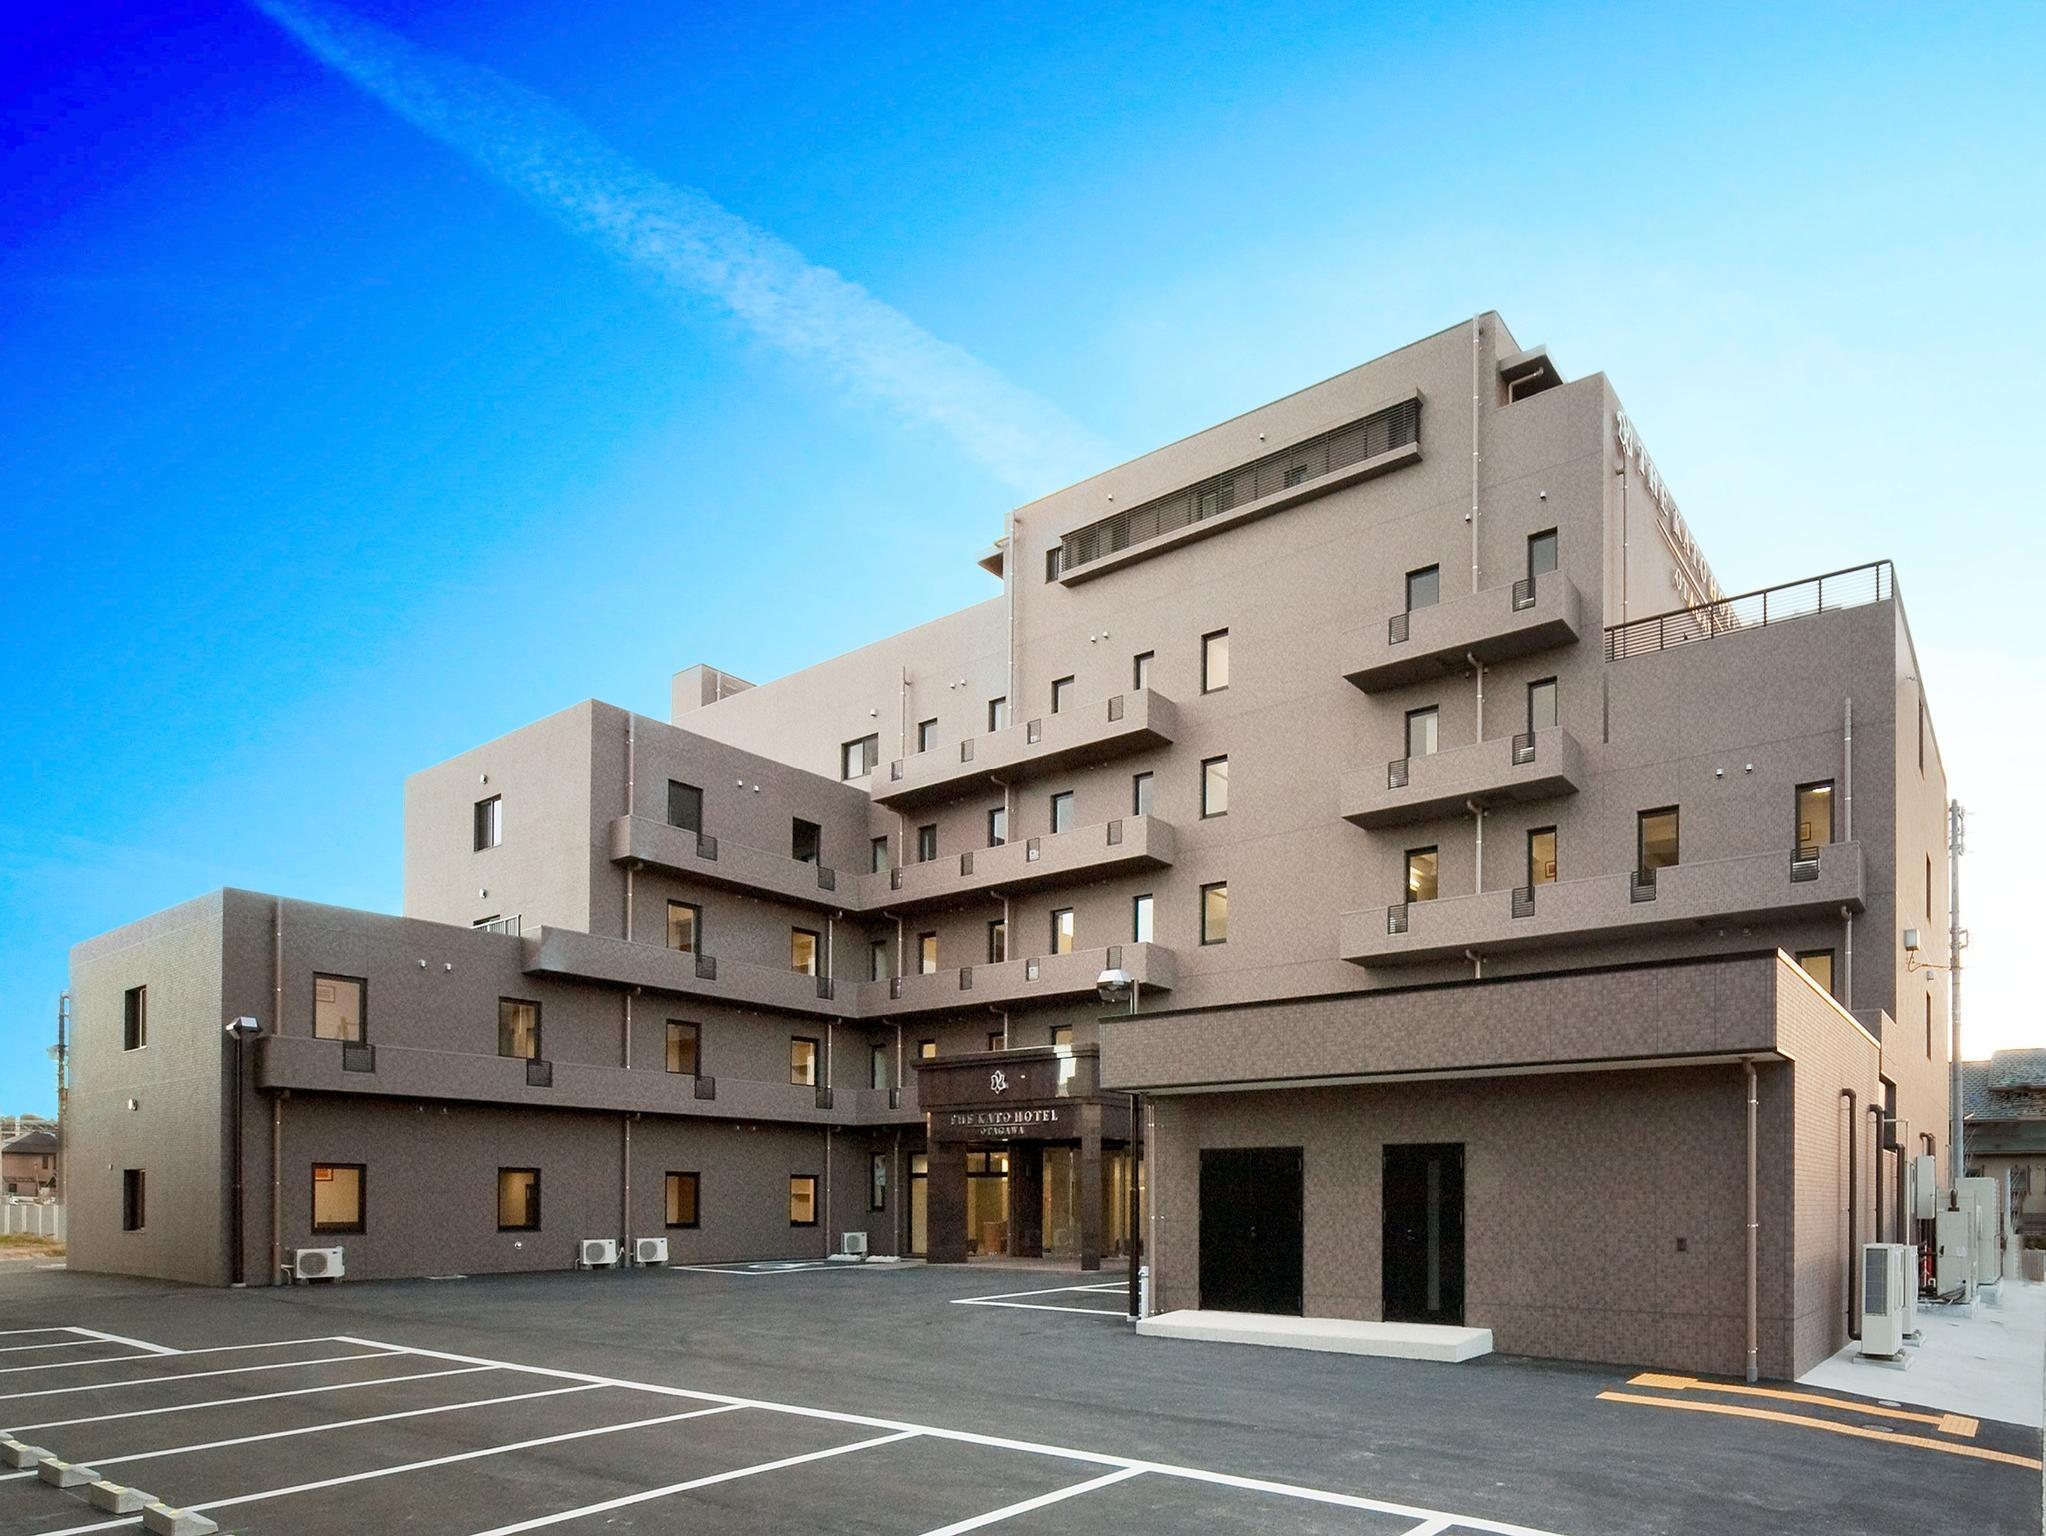 The Kato Hotel, Tōkai